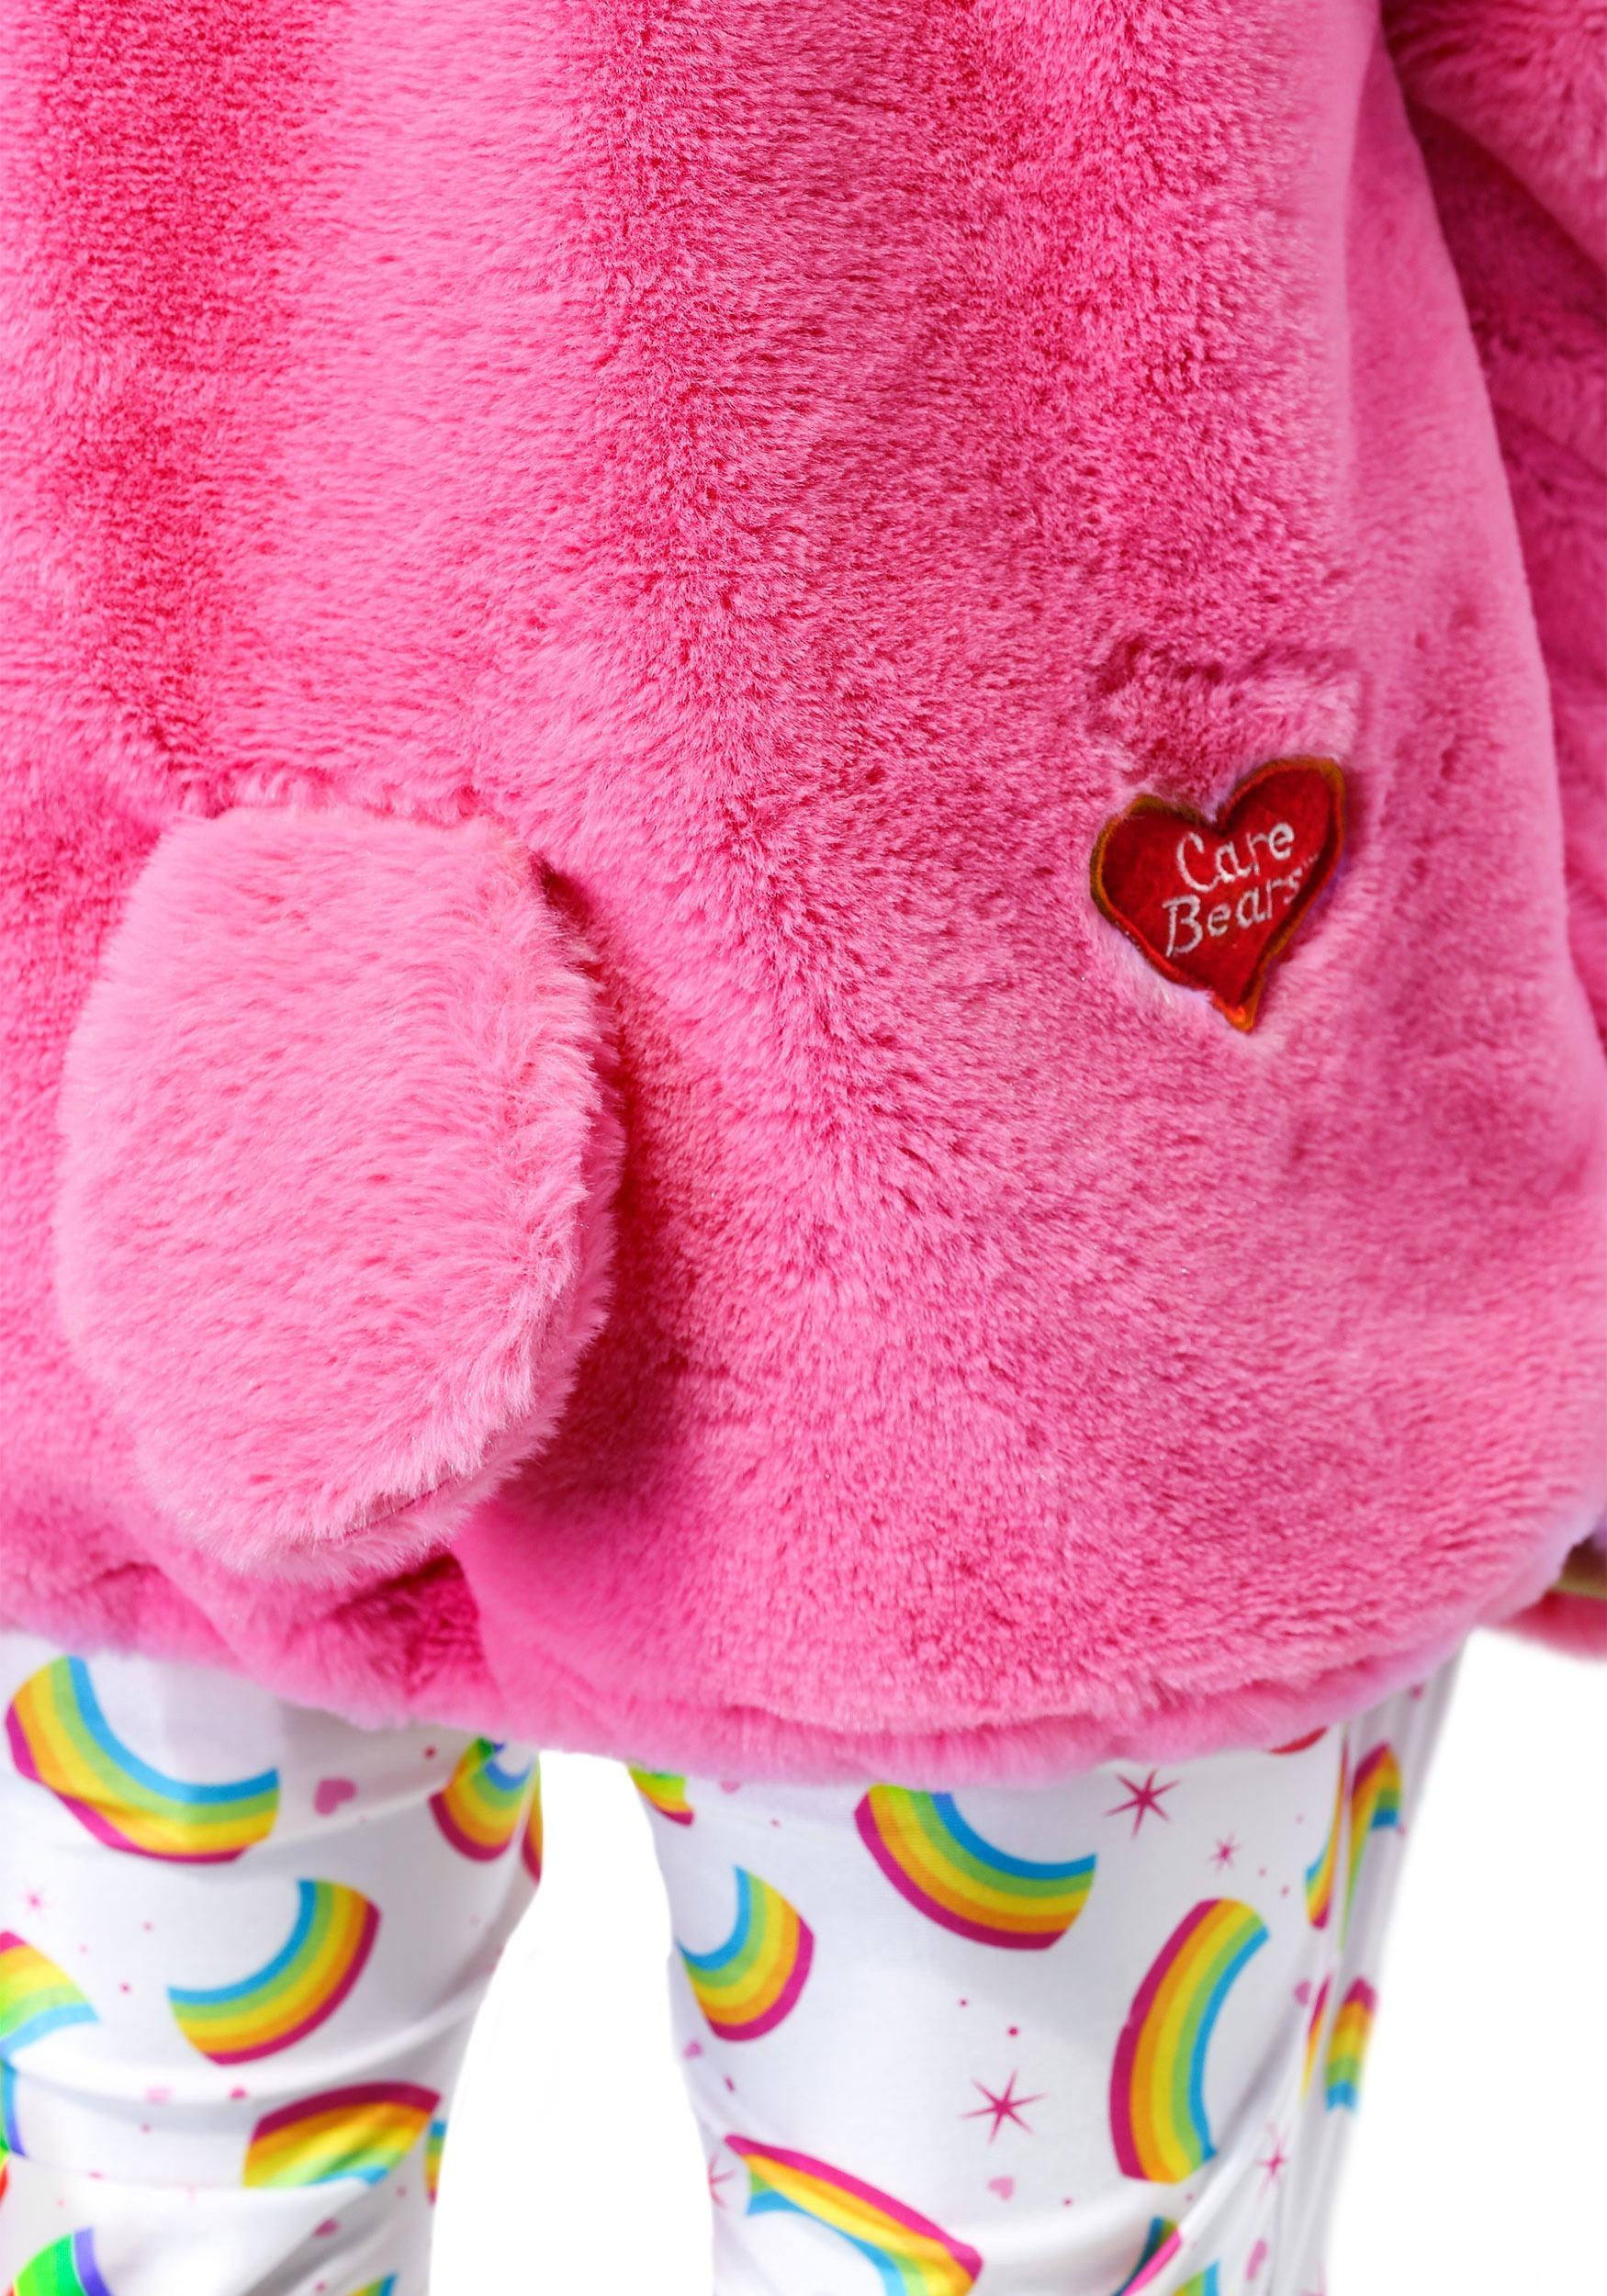 Girls Child Care Bears Deluxe Pink Rainbow Cheer Bear Costume Dress